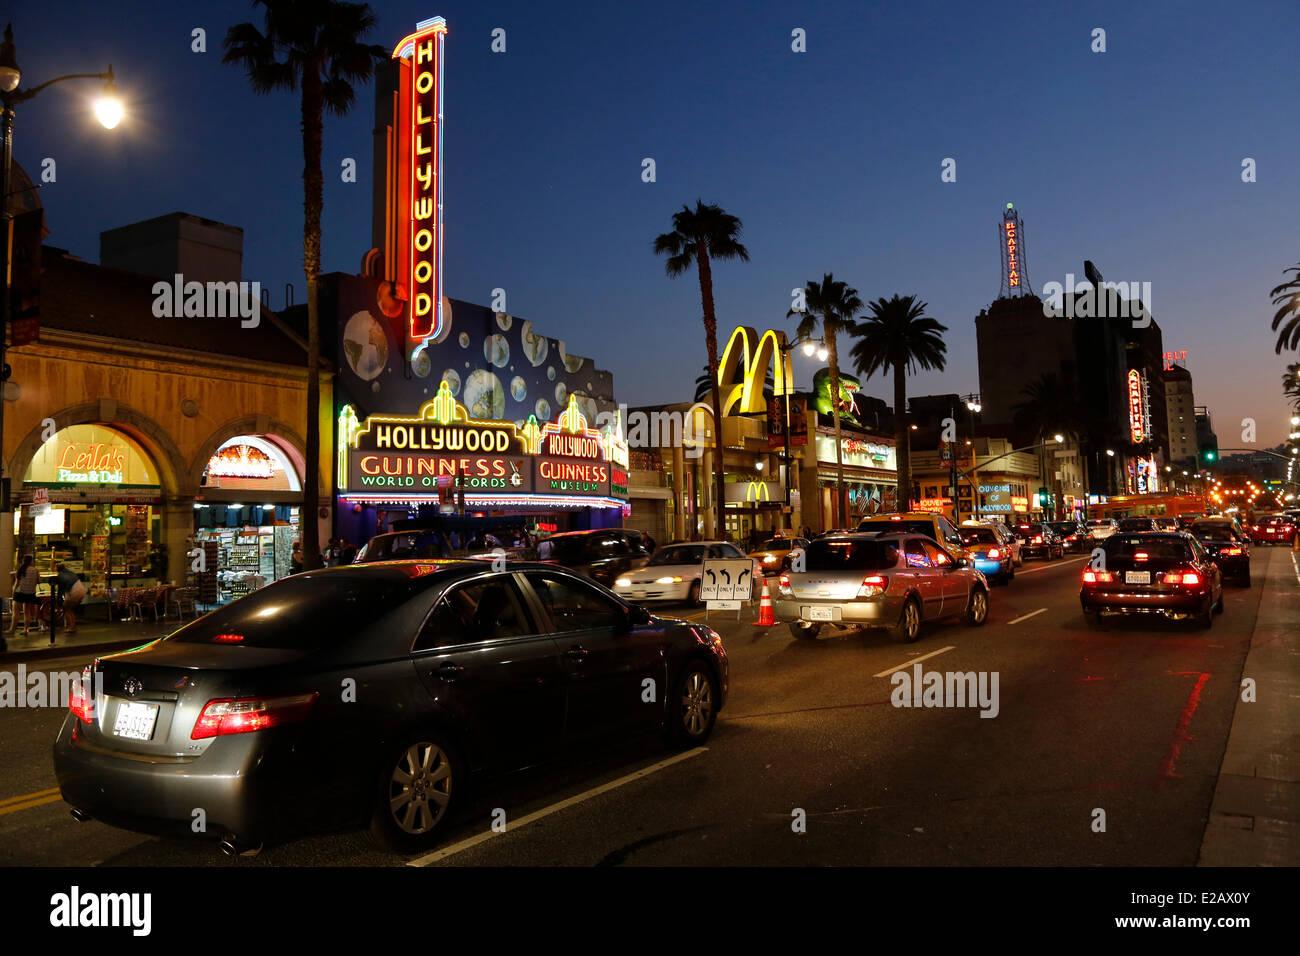 Los angeles ca united states pictures citiestips com - Los Angeles Ca United States City Photo United States California Los